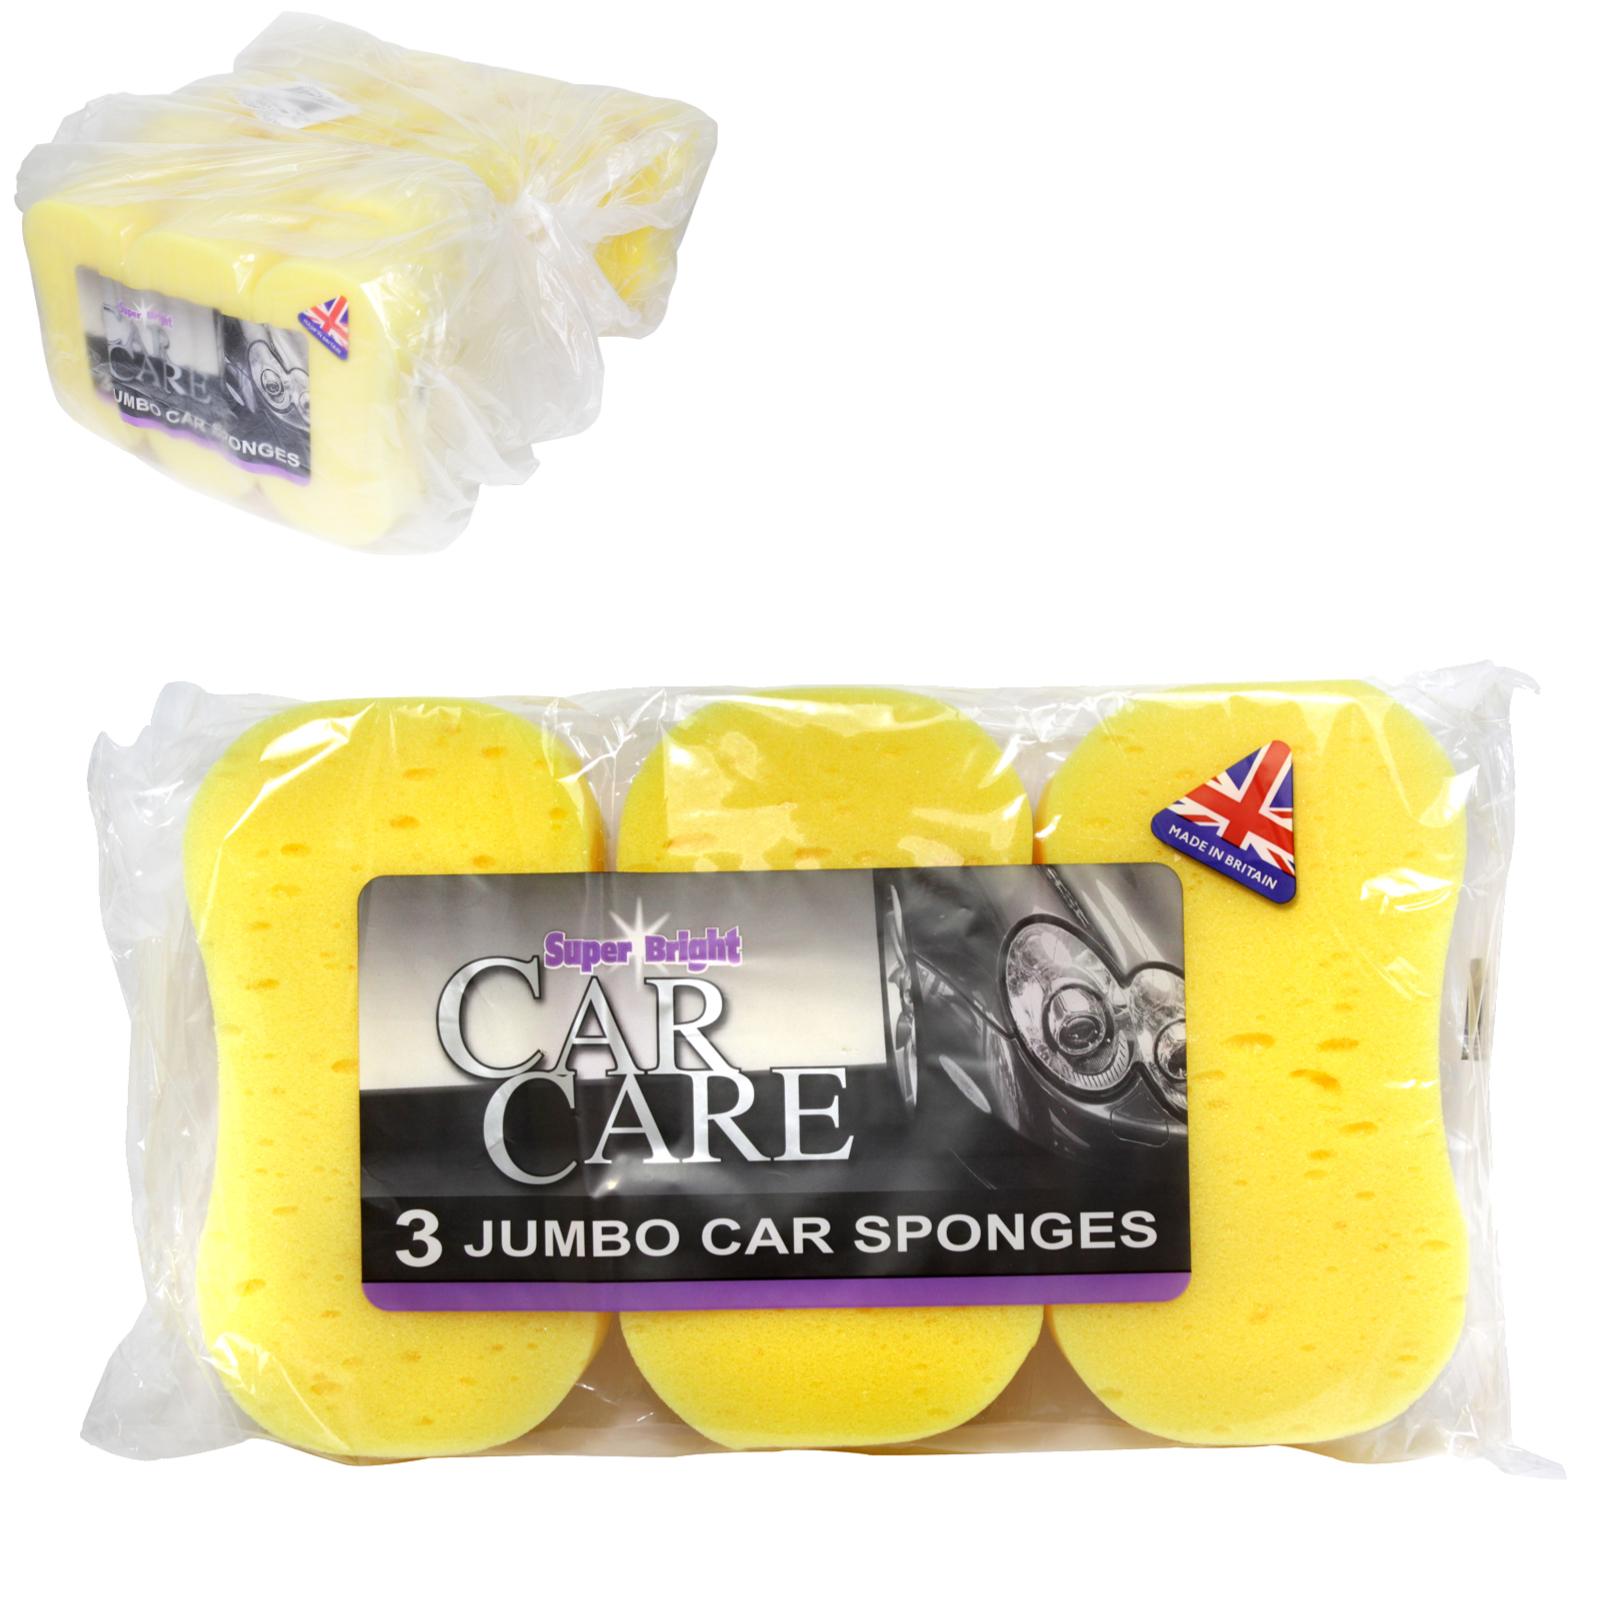 SUPERBRIGHT CAR CARE 3PK CAR SPONGES X10